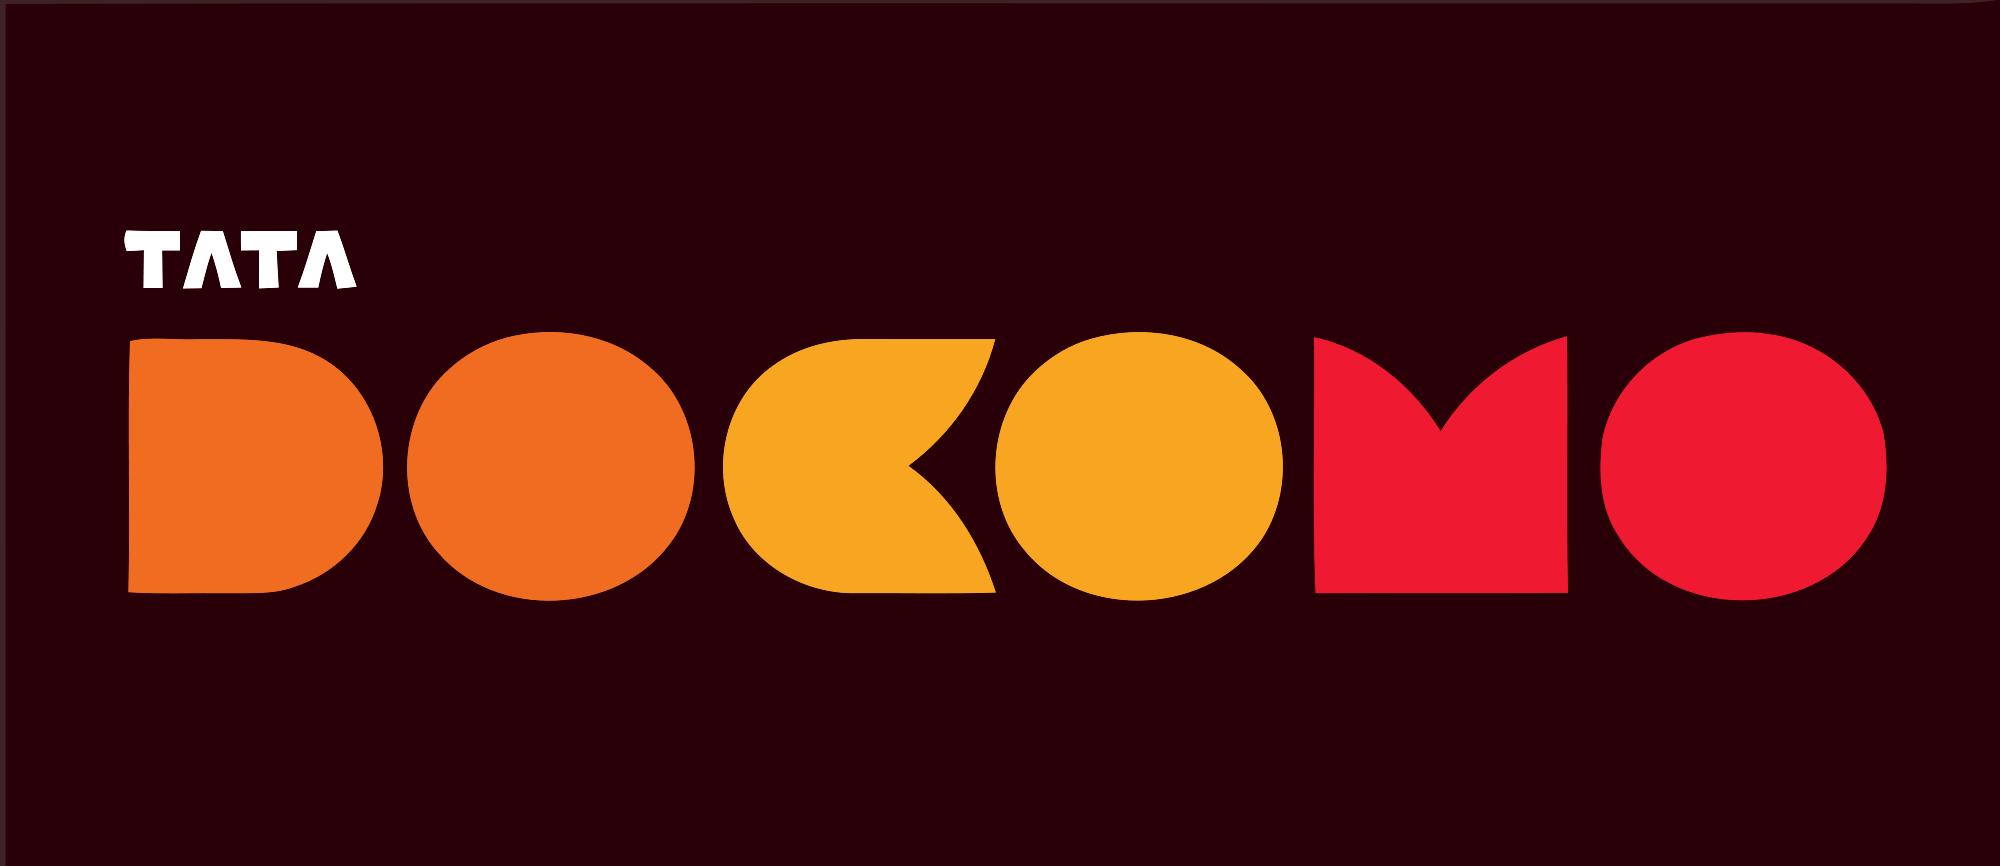 2000px-Tata_Docomo_Logo Uninor Logo Png